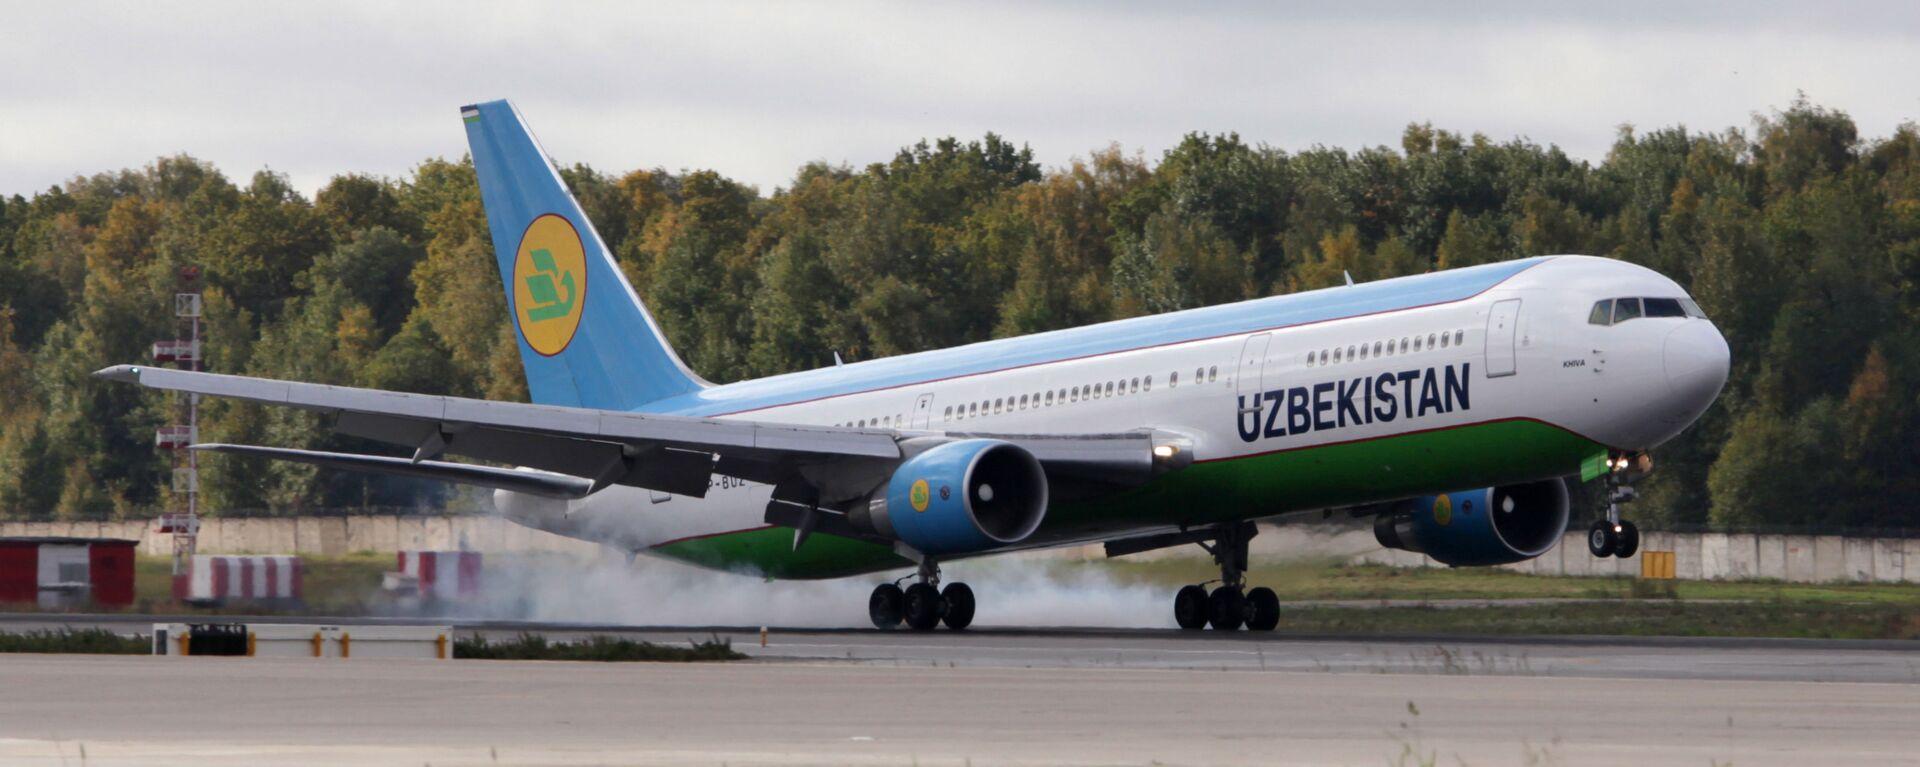 Боинг-767 авиакомпании Uzbekistan Airways в аэропорту Домодедово. - Sputnik Тоҷикистон, 1920, 20.04.2021